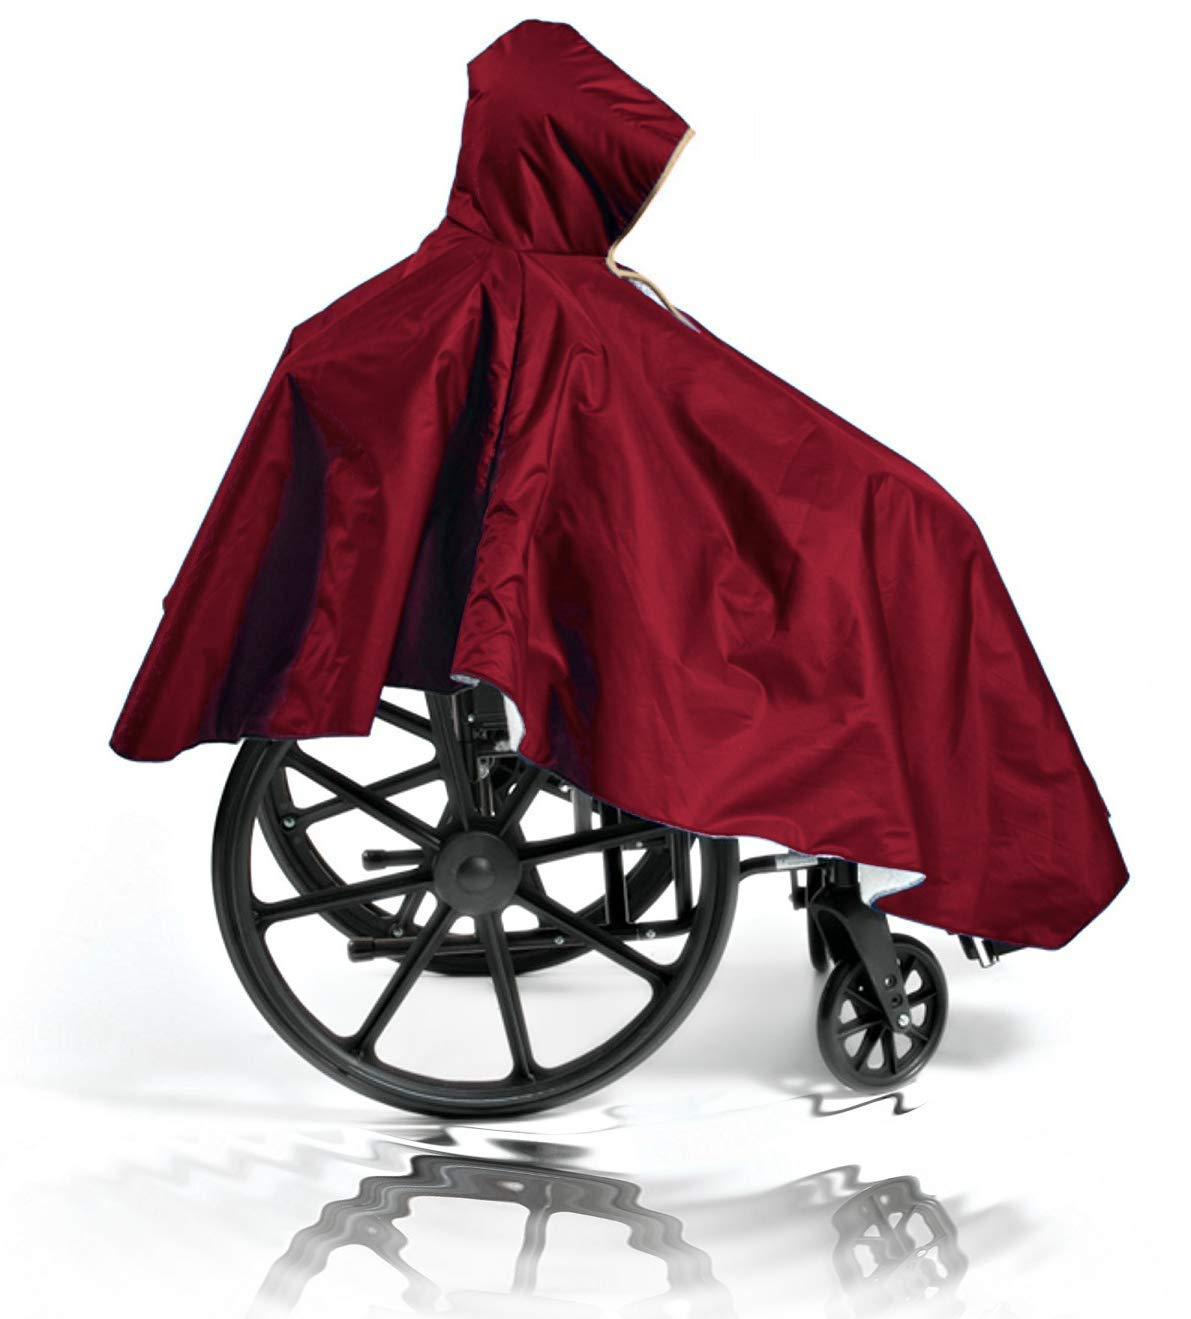 Wheelchair Winter Poncho – Warm Sherpa Lining - Adult Elderly Seniors Cape – Heavy Duty Reusable – Full Waterproof Coverage (Single Pack, Burgundy)